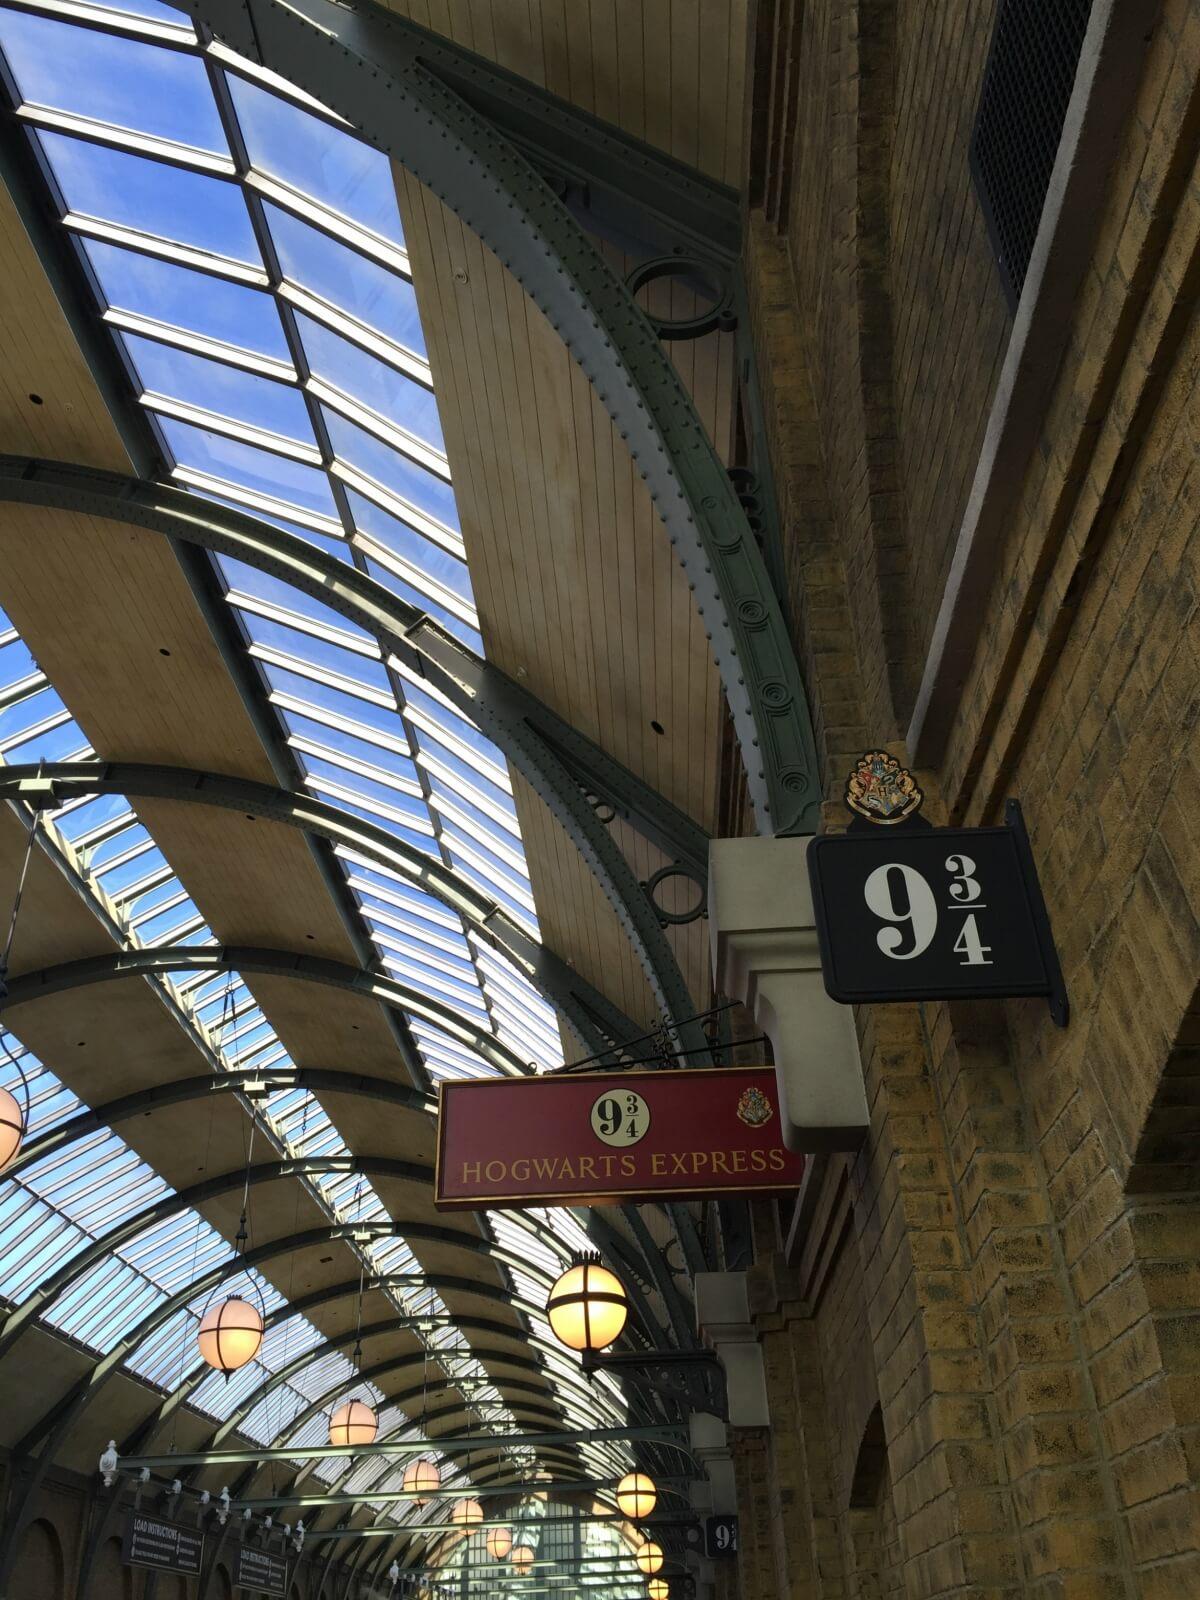 Platform 9 and 3/4s